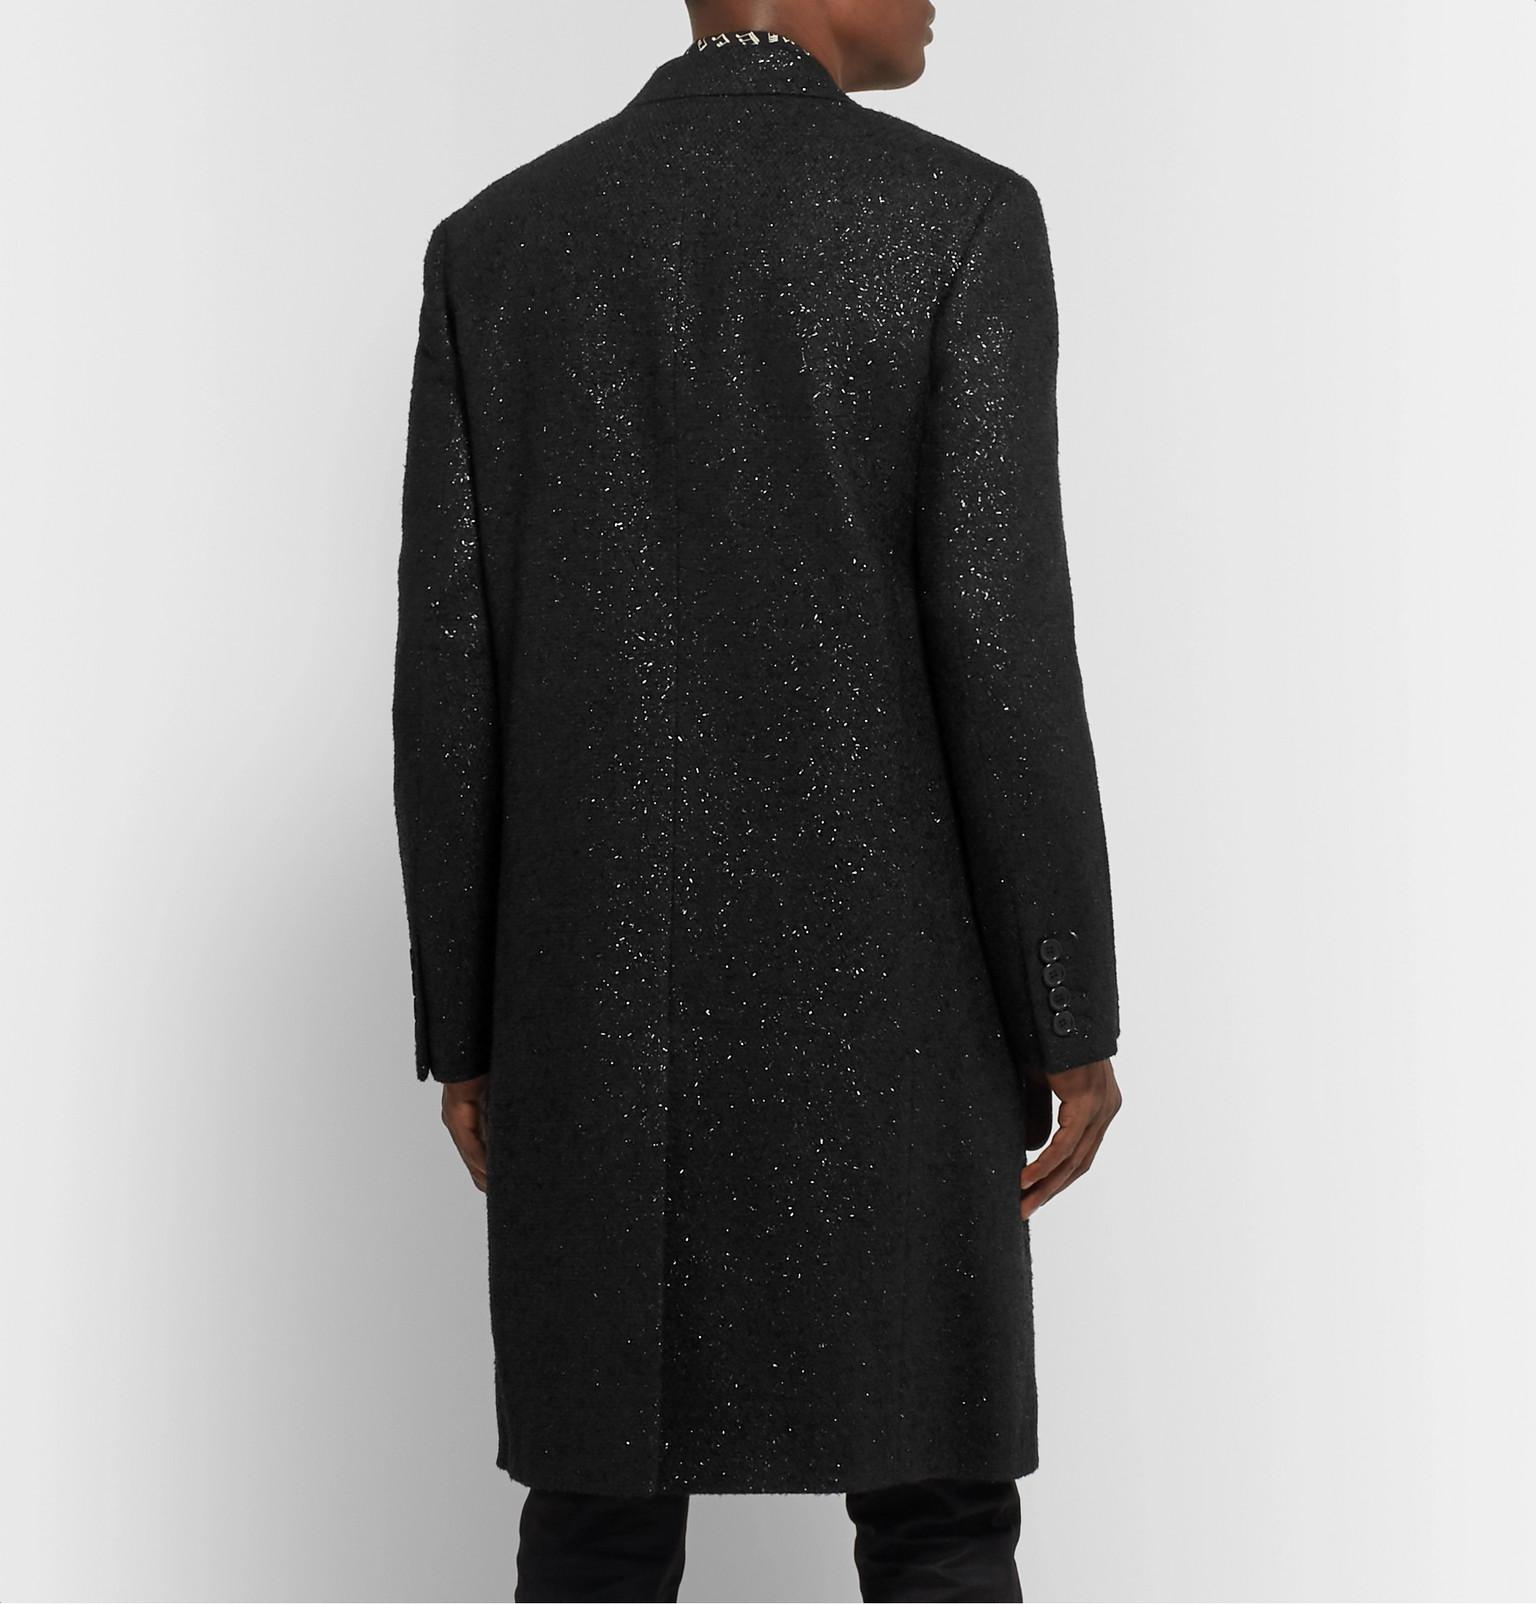 d1f39afdfd2 SAINT LAURENT - Metallic Woven Double-Breasted Overcoat